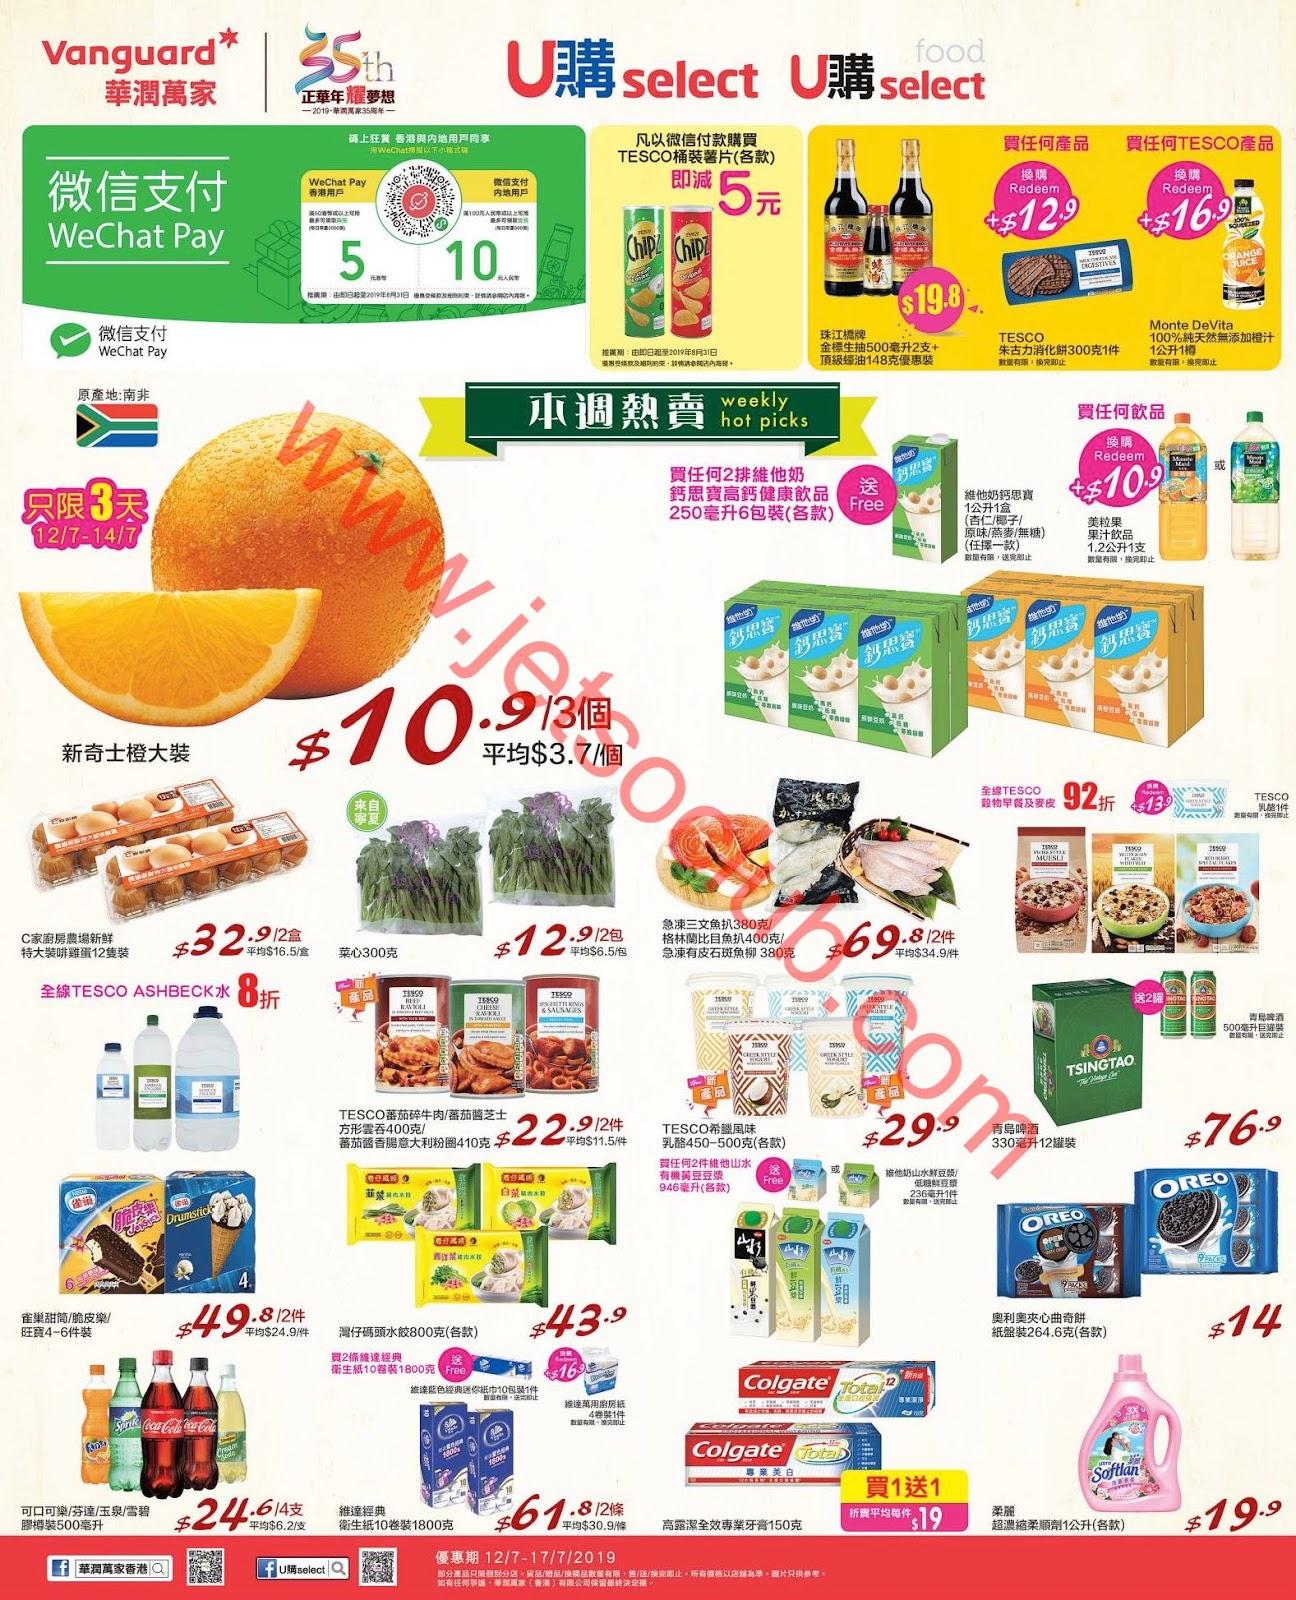 U購 select / 華潤萬家超級市場最新優惠(12/7) ( Jetso Club 著數俱樂部 )